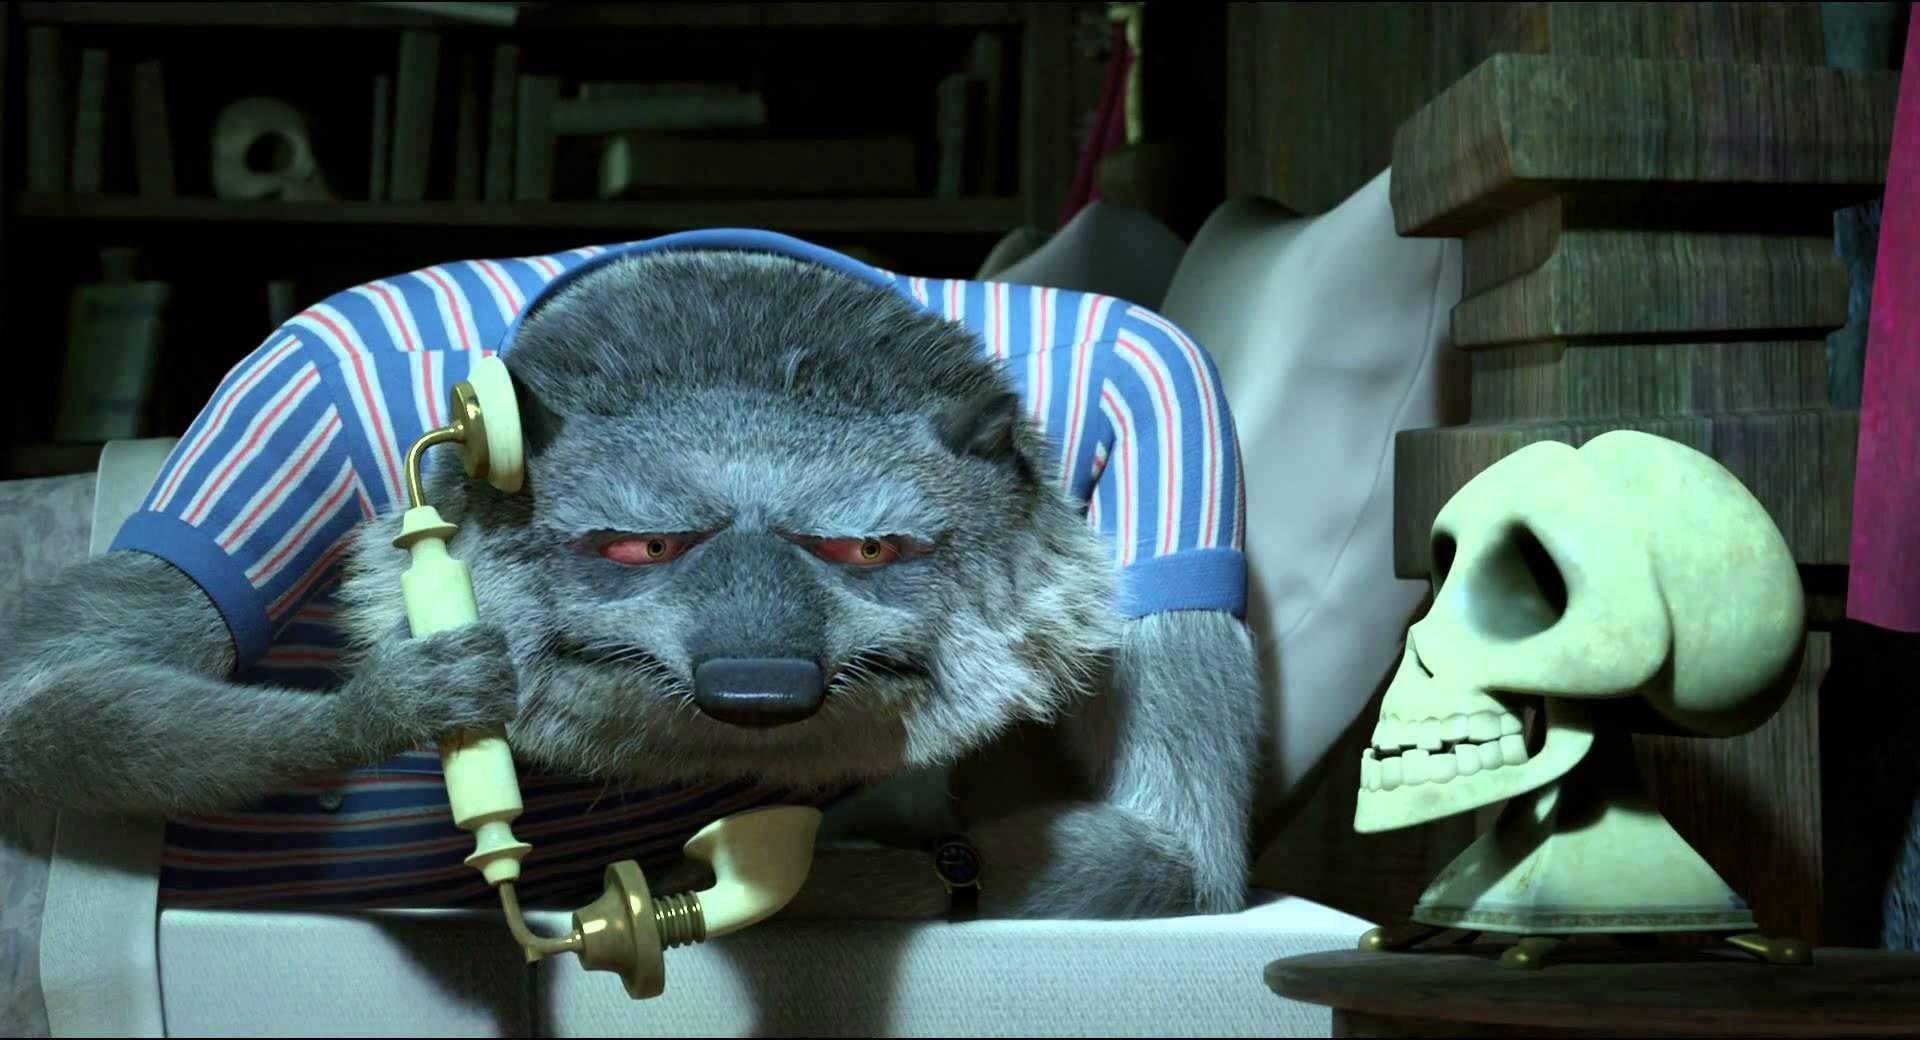 Hotel Transylvania (2012) [USAPG, 1 h 31 min] Animation